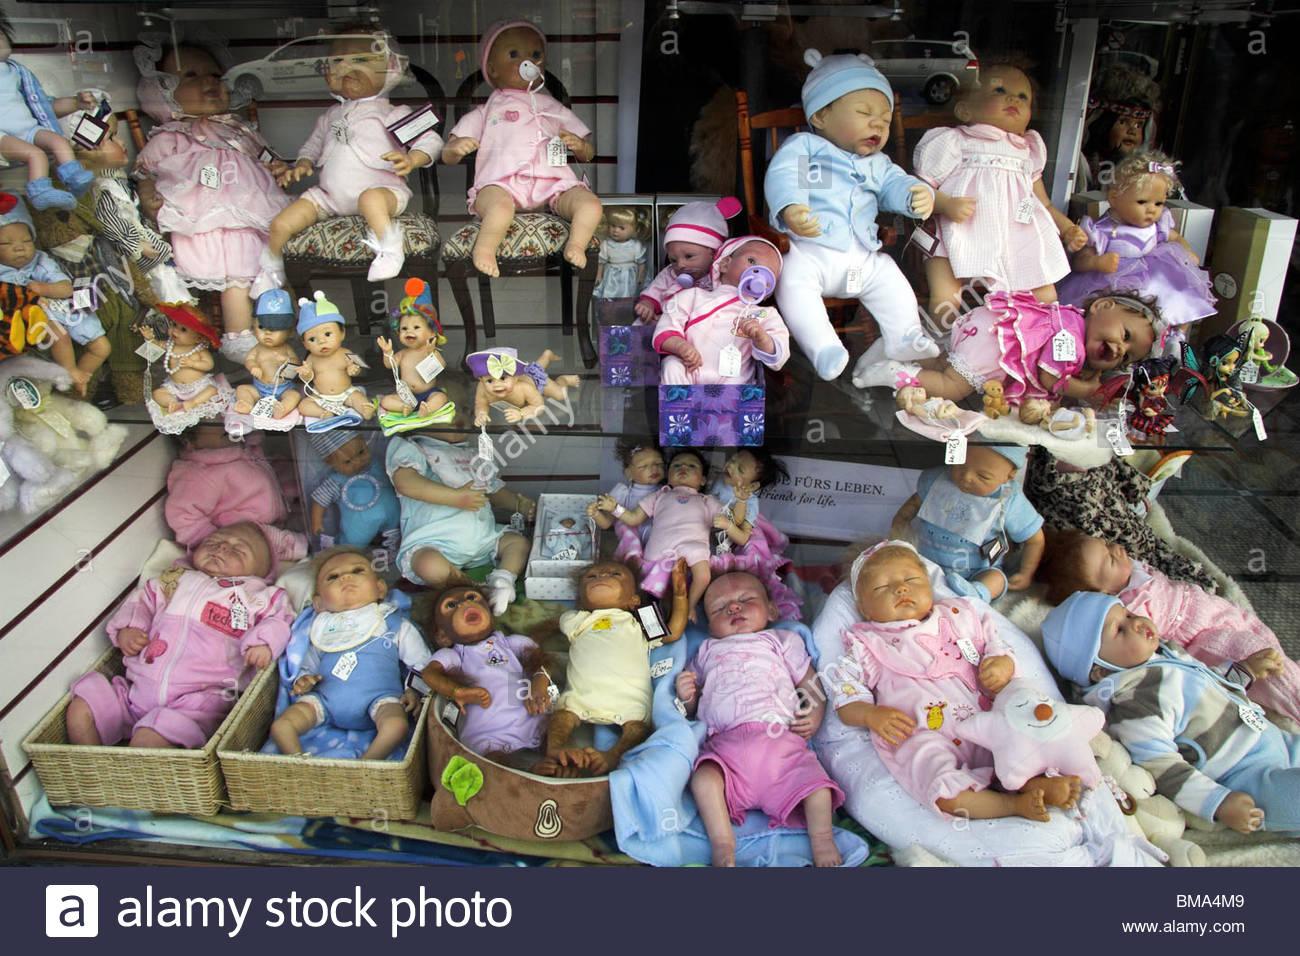 Reborn Baby Dolls In A Shop Window Display Skegness